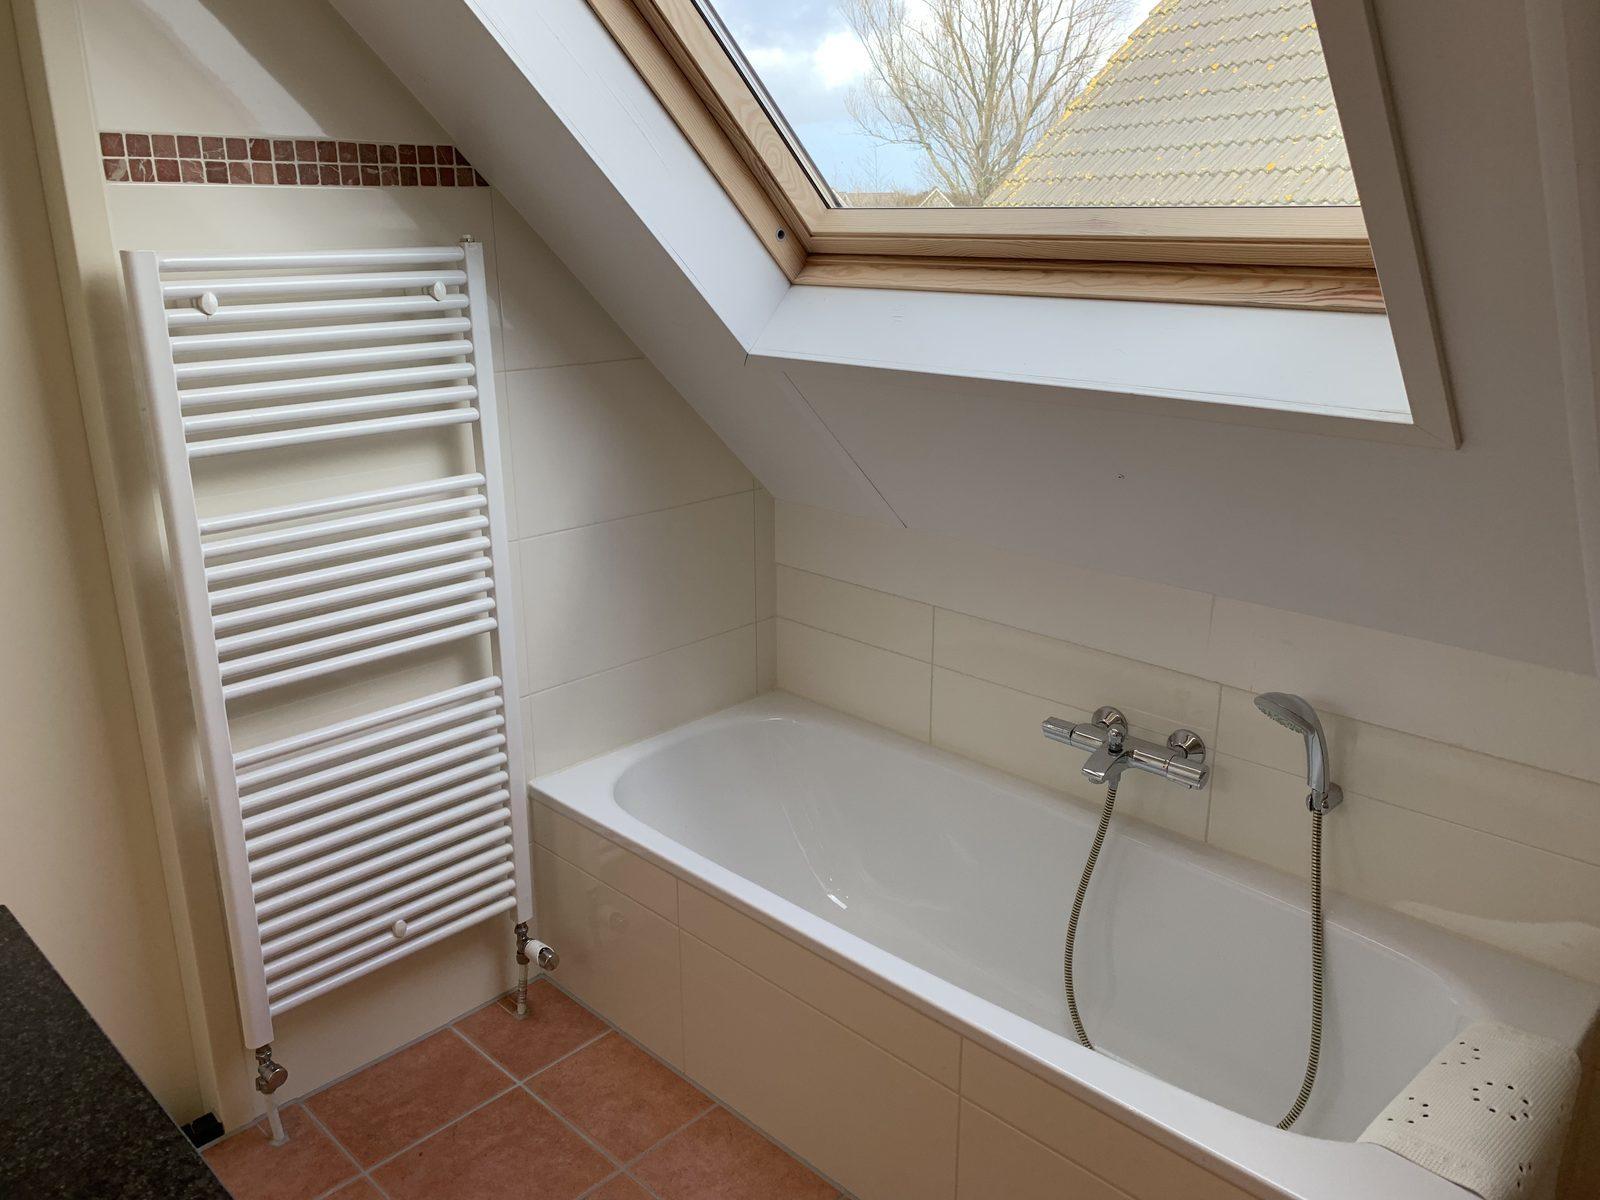 IJsselmeerstraat 153 Komfort Plus, Schlafzimmer und Badezimmer unten